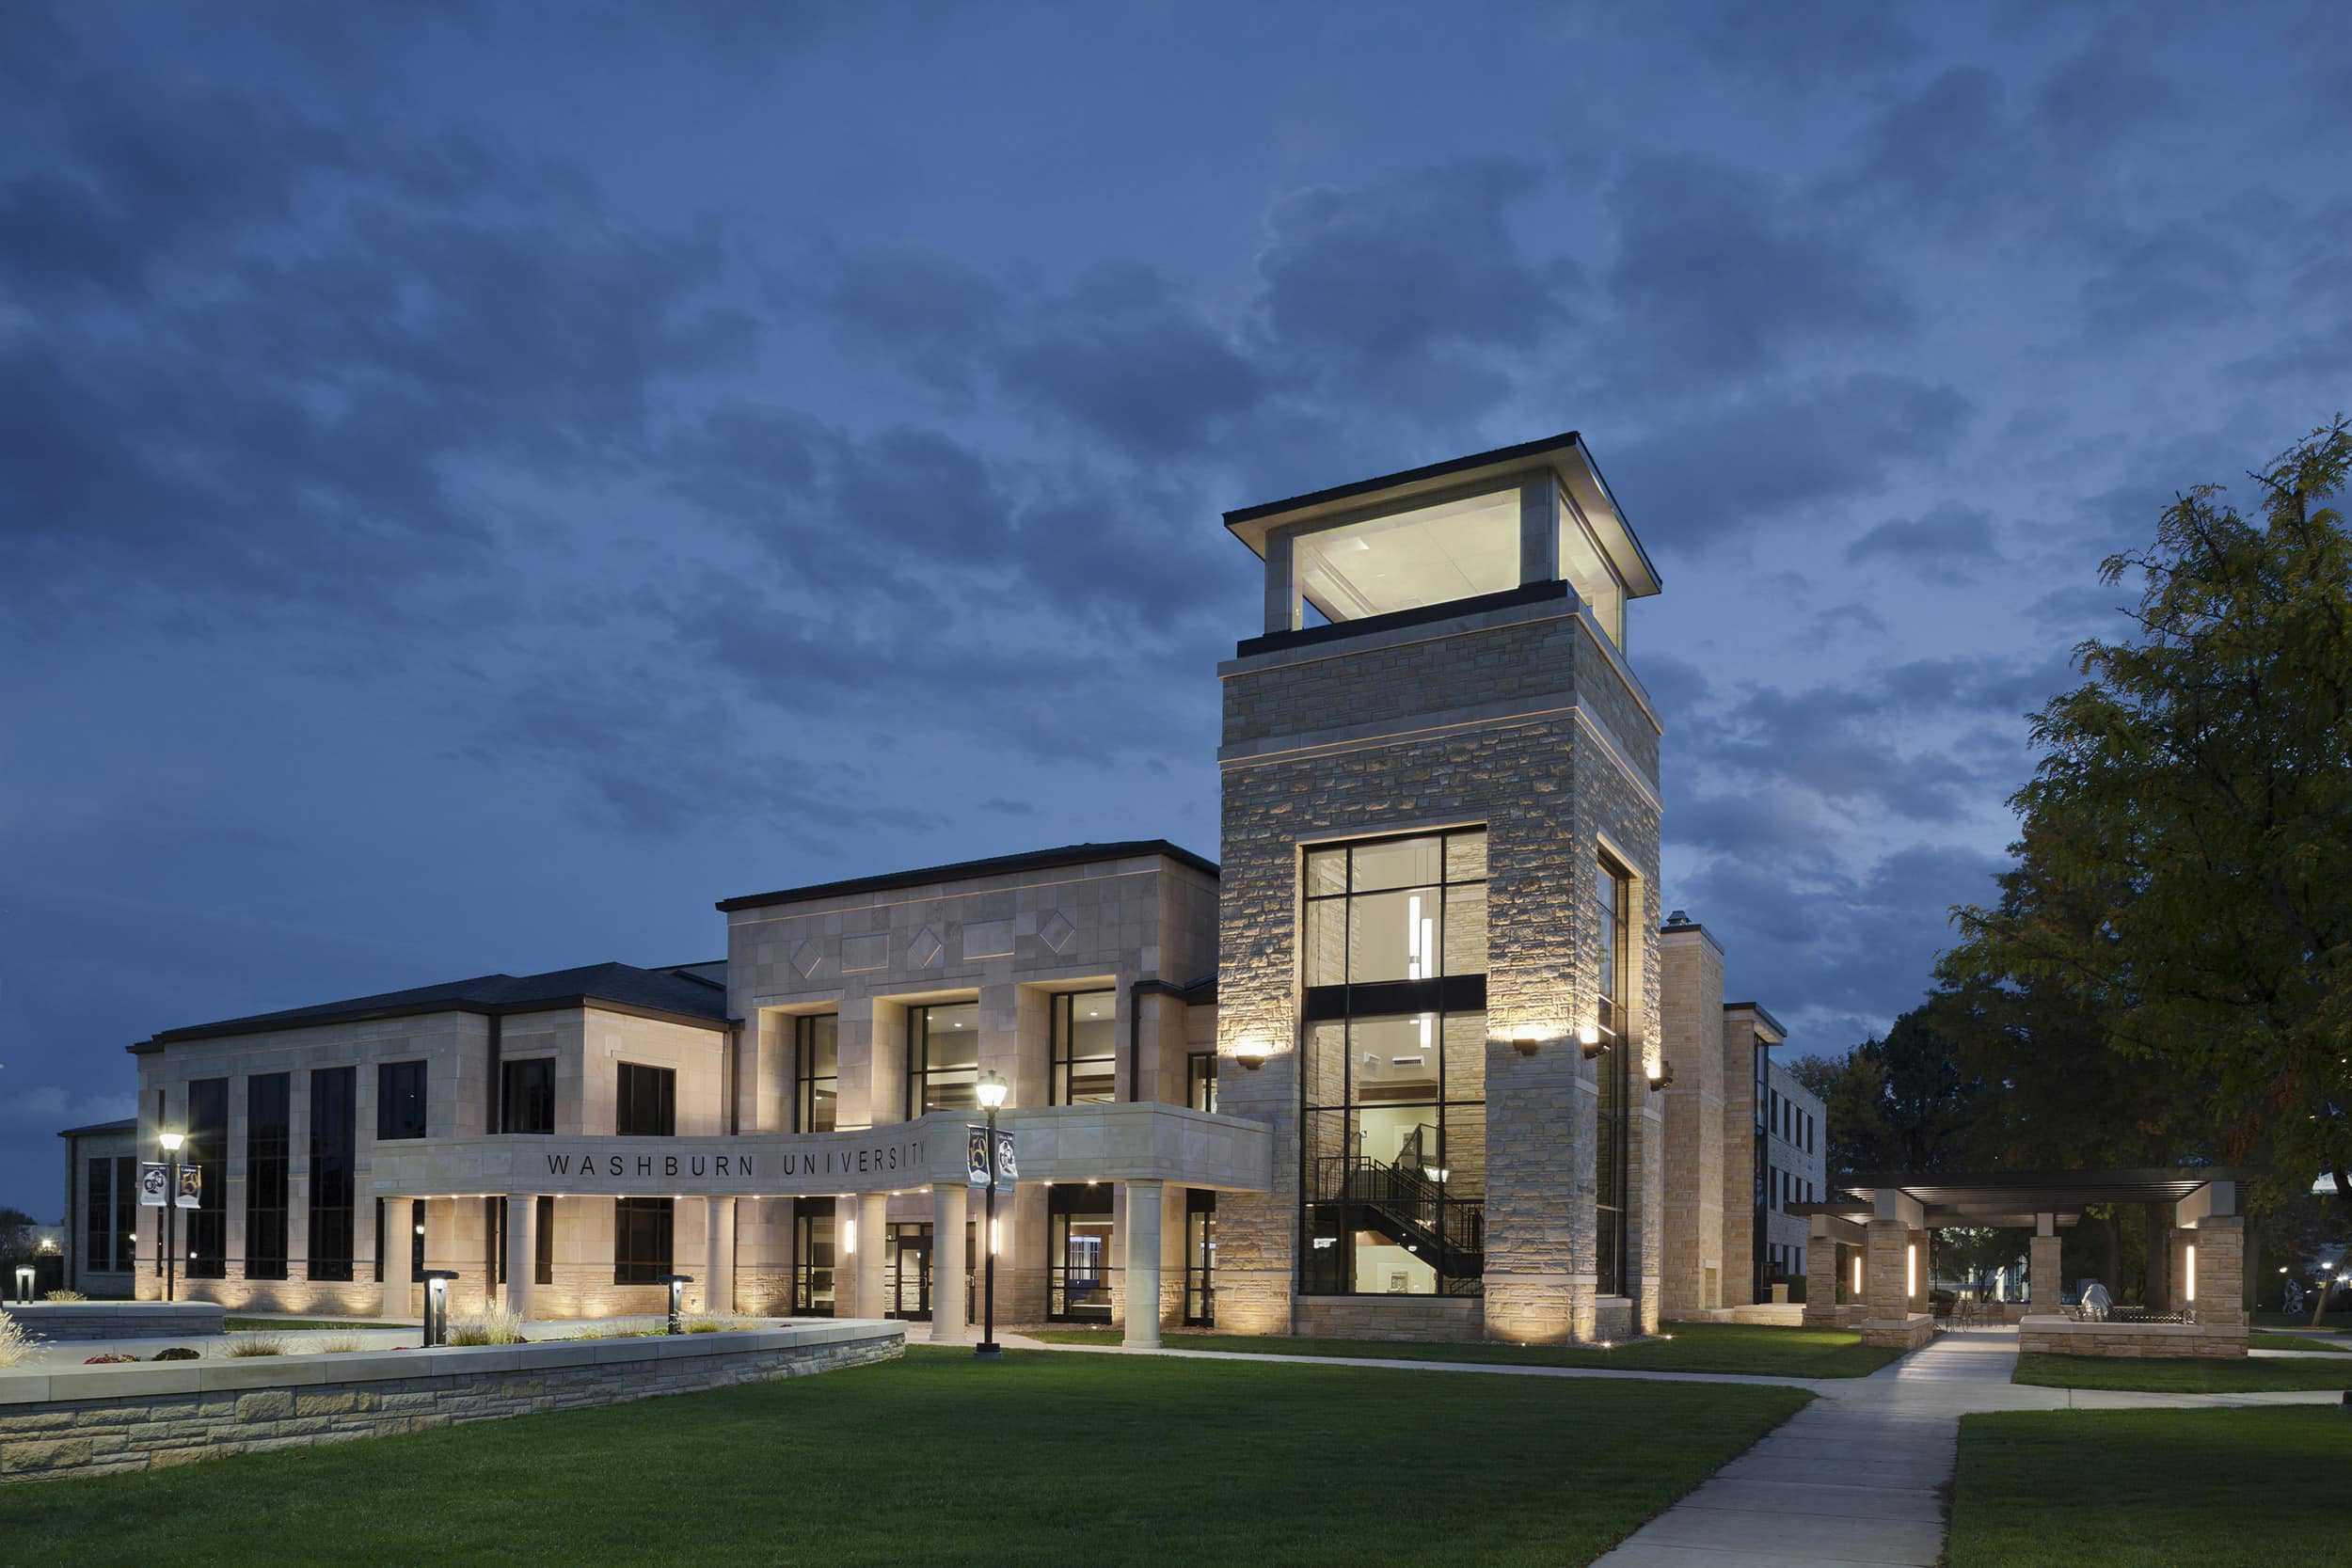 washburn university 1